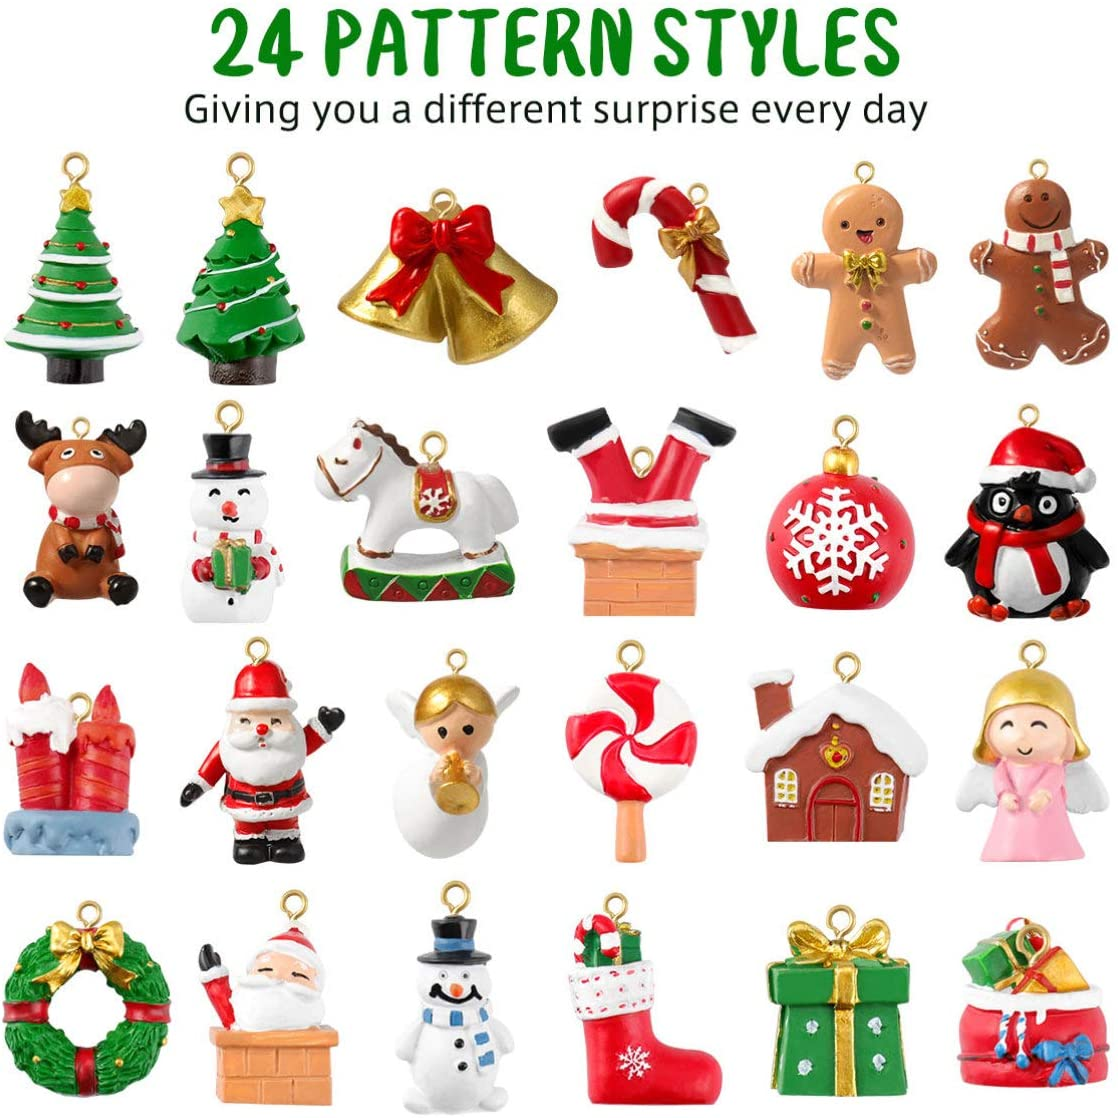 Mini Christmas Ornaments, Christmas Advent Calendar 2020 Ornaments Set of 24 Resin Christmas Tree